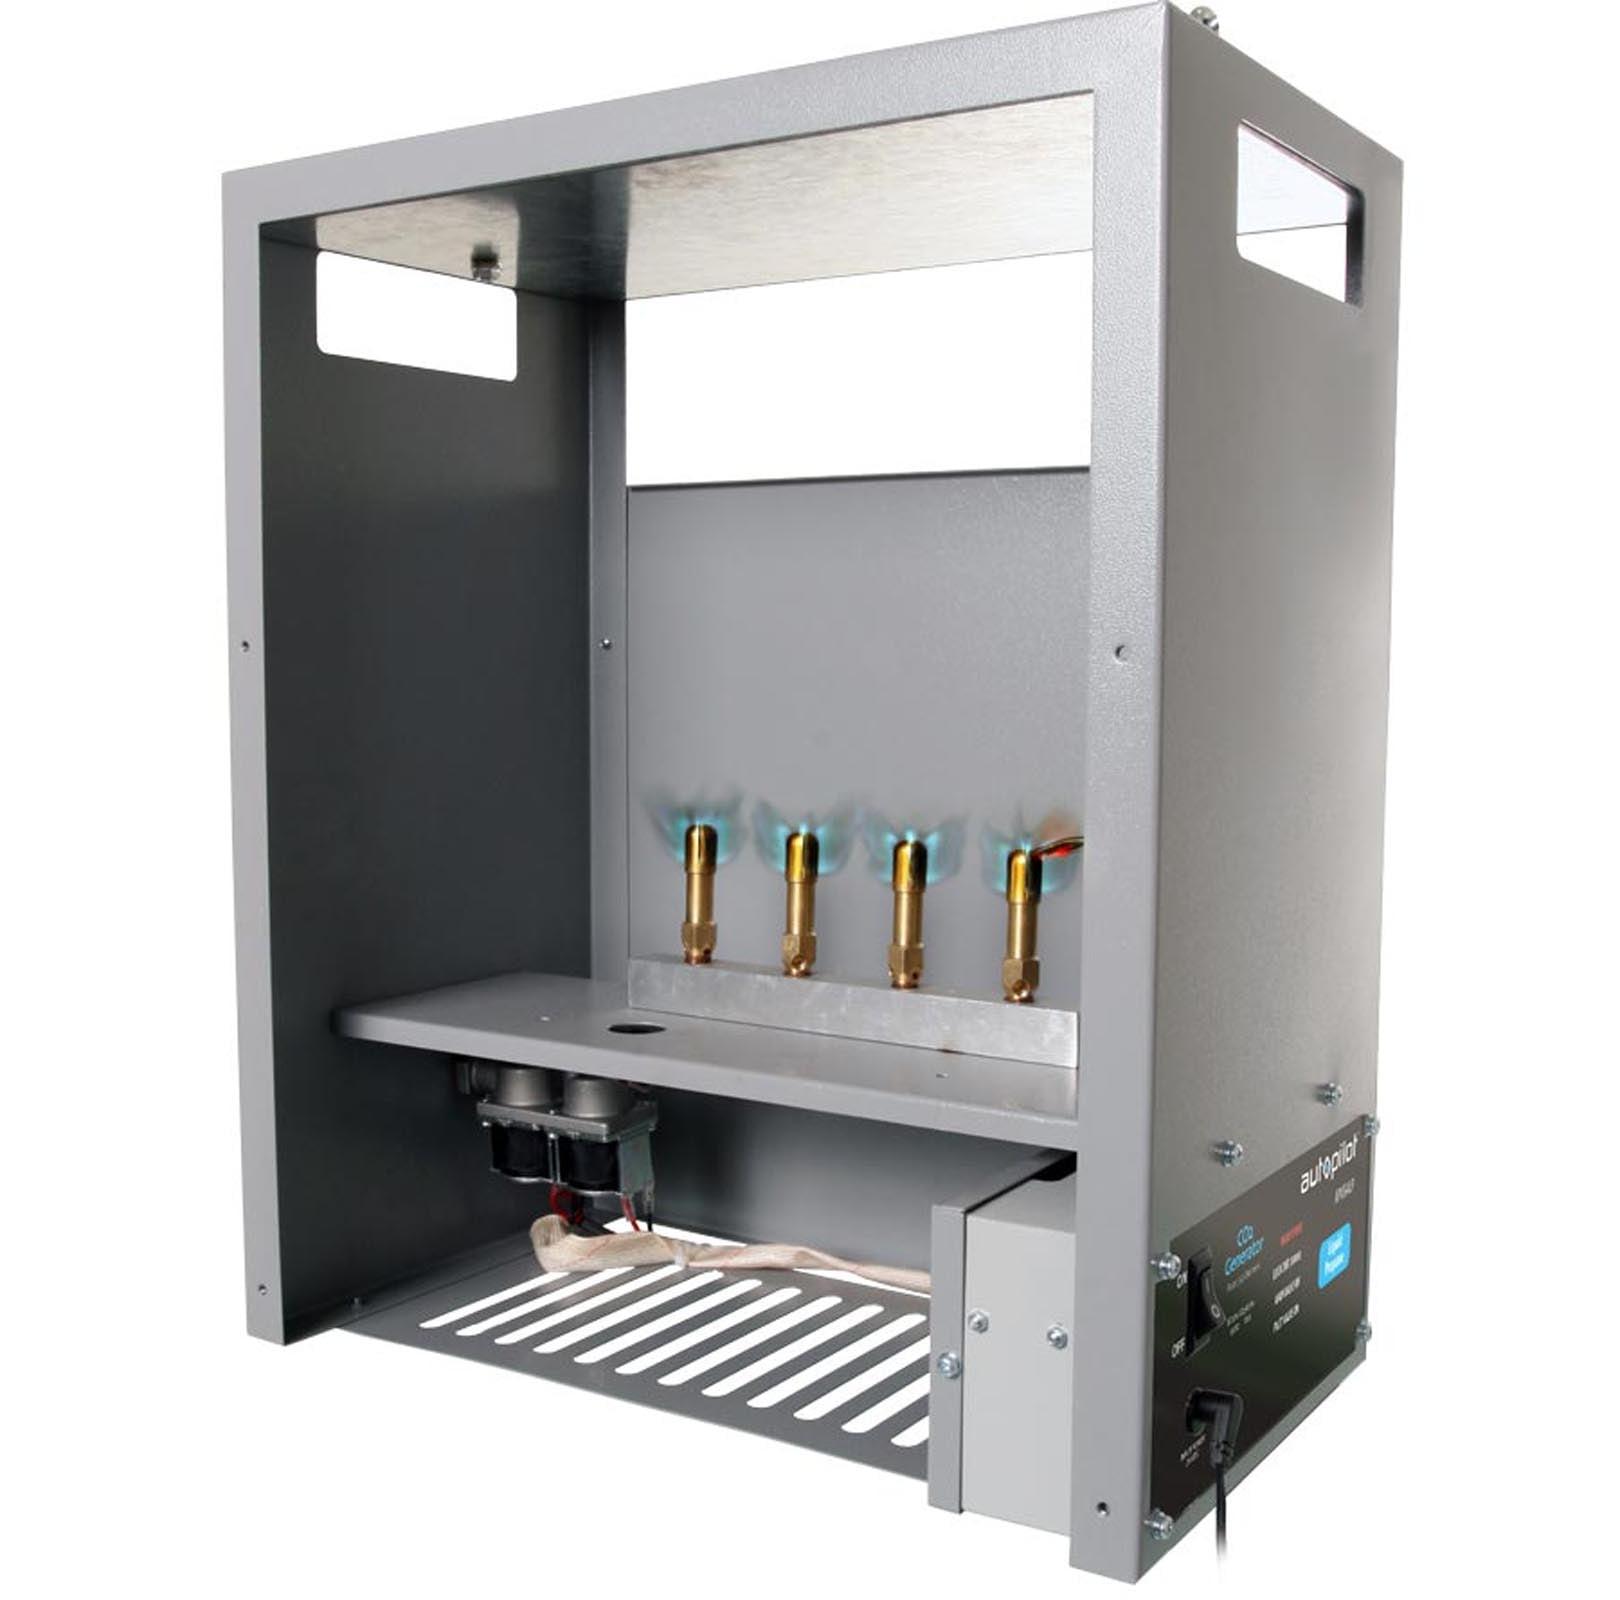 AutoPilot APCG4LPH High Altitude 4 Burner Co2 Generator LP/HA | 2,262-9,052 BTU